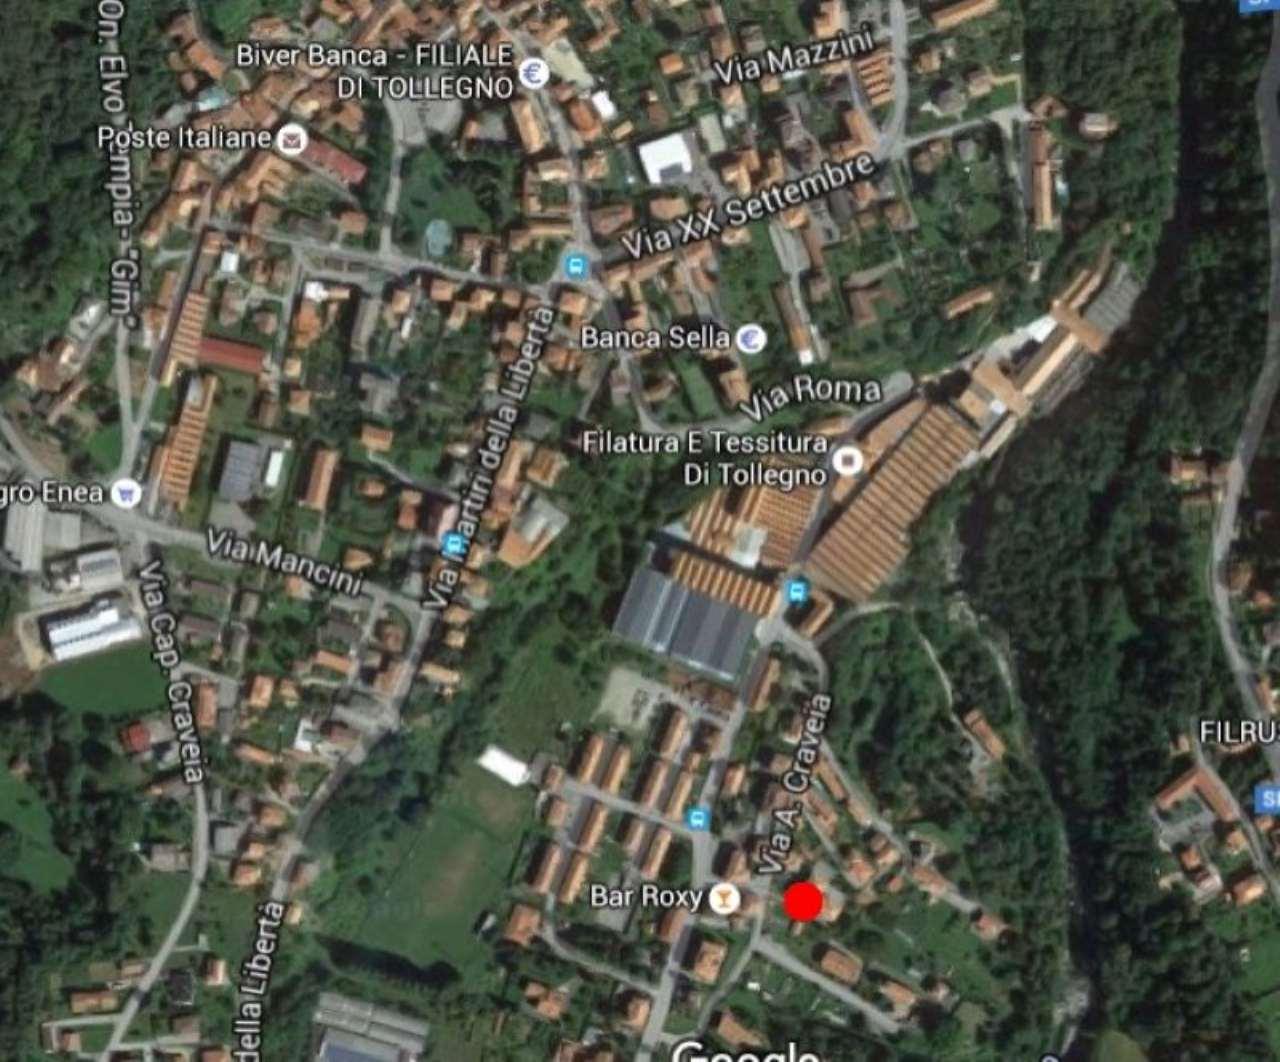 Bilocale Tollegno Via Arrigo Craveia 3